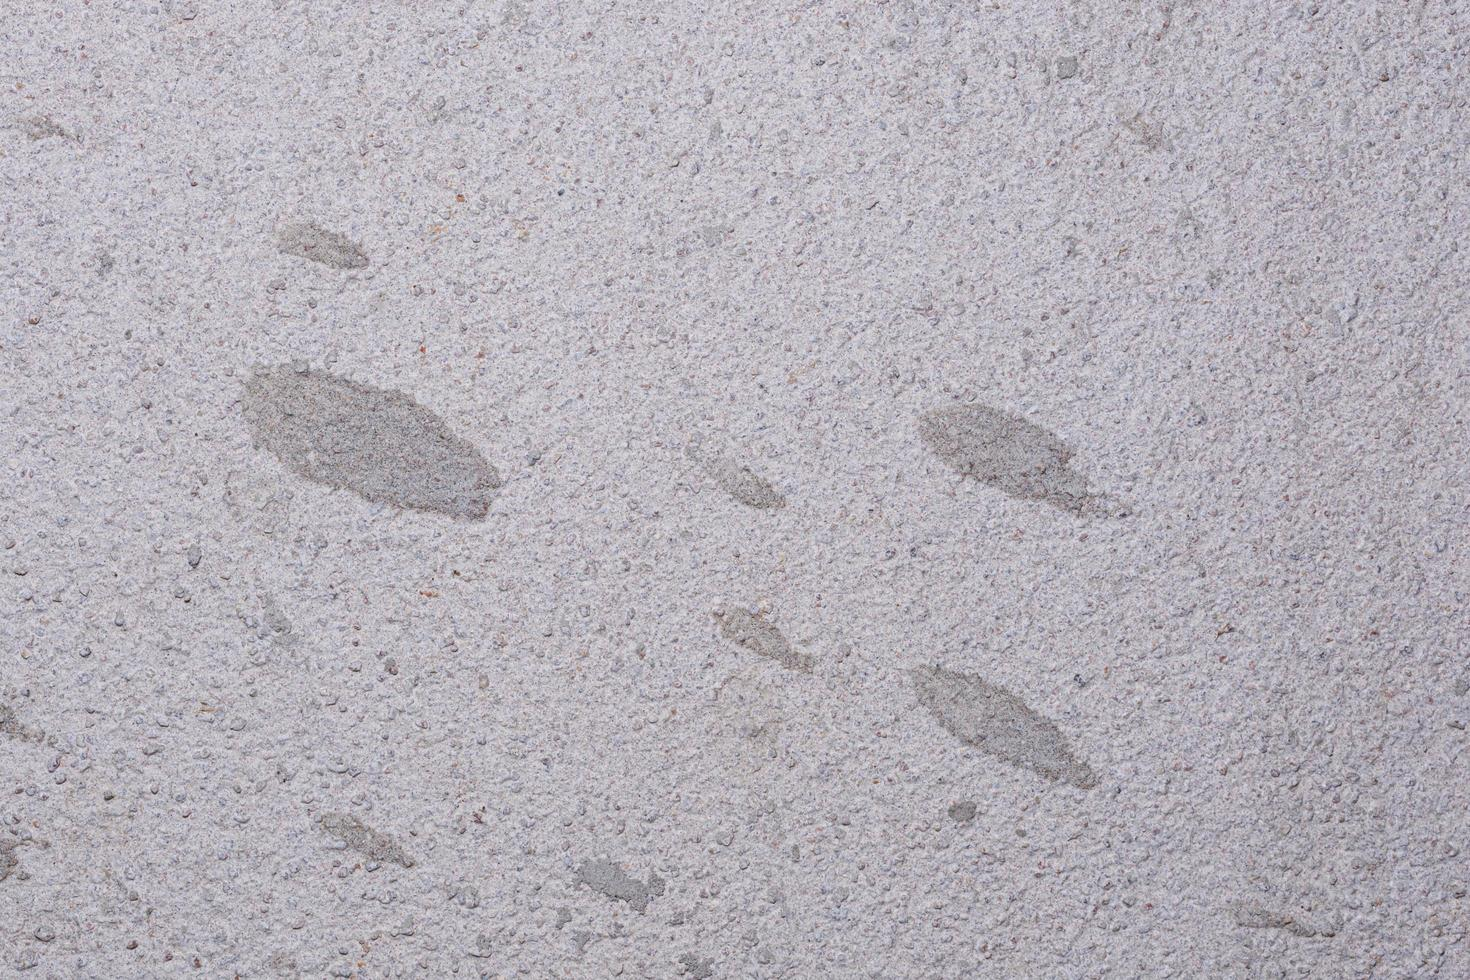 Old cement floor background photo